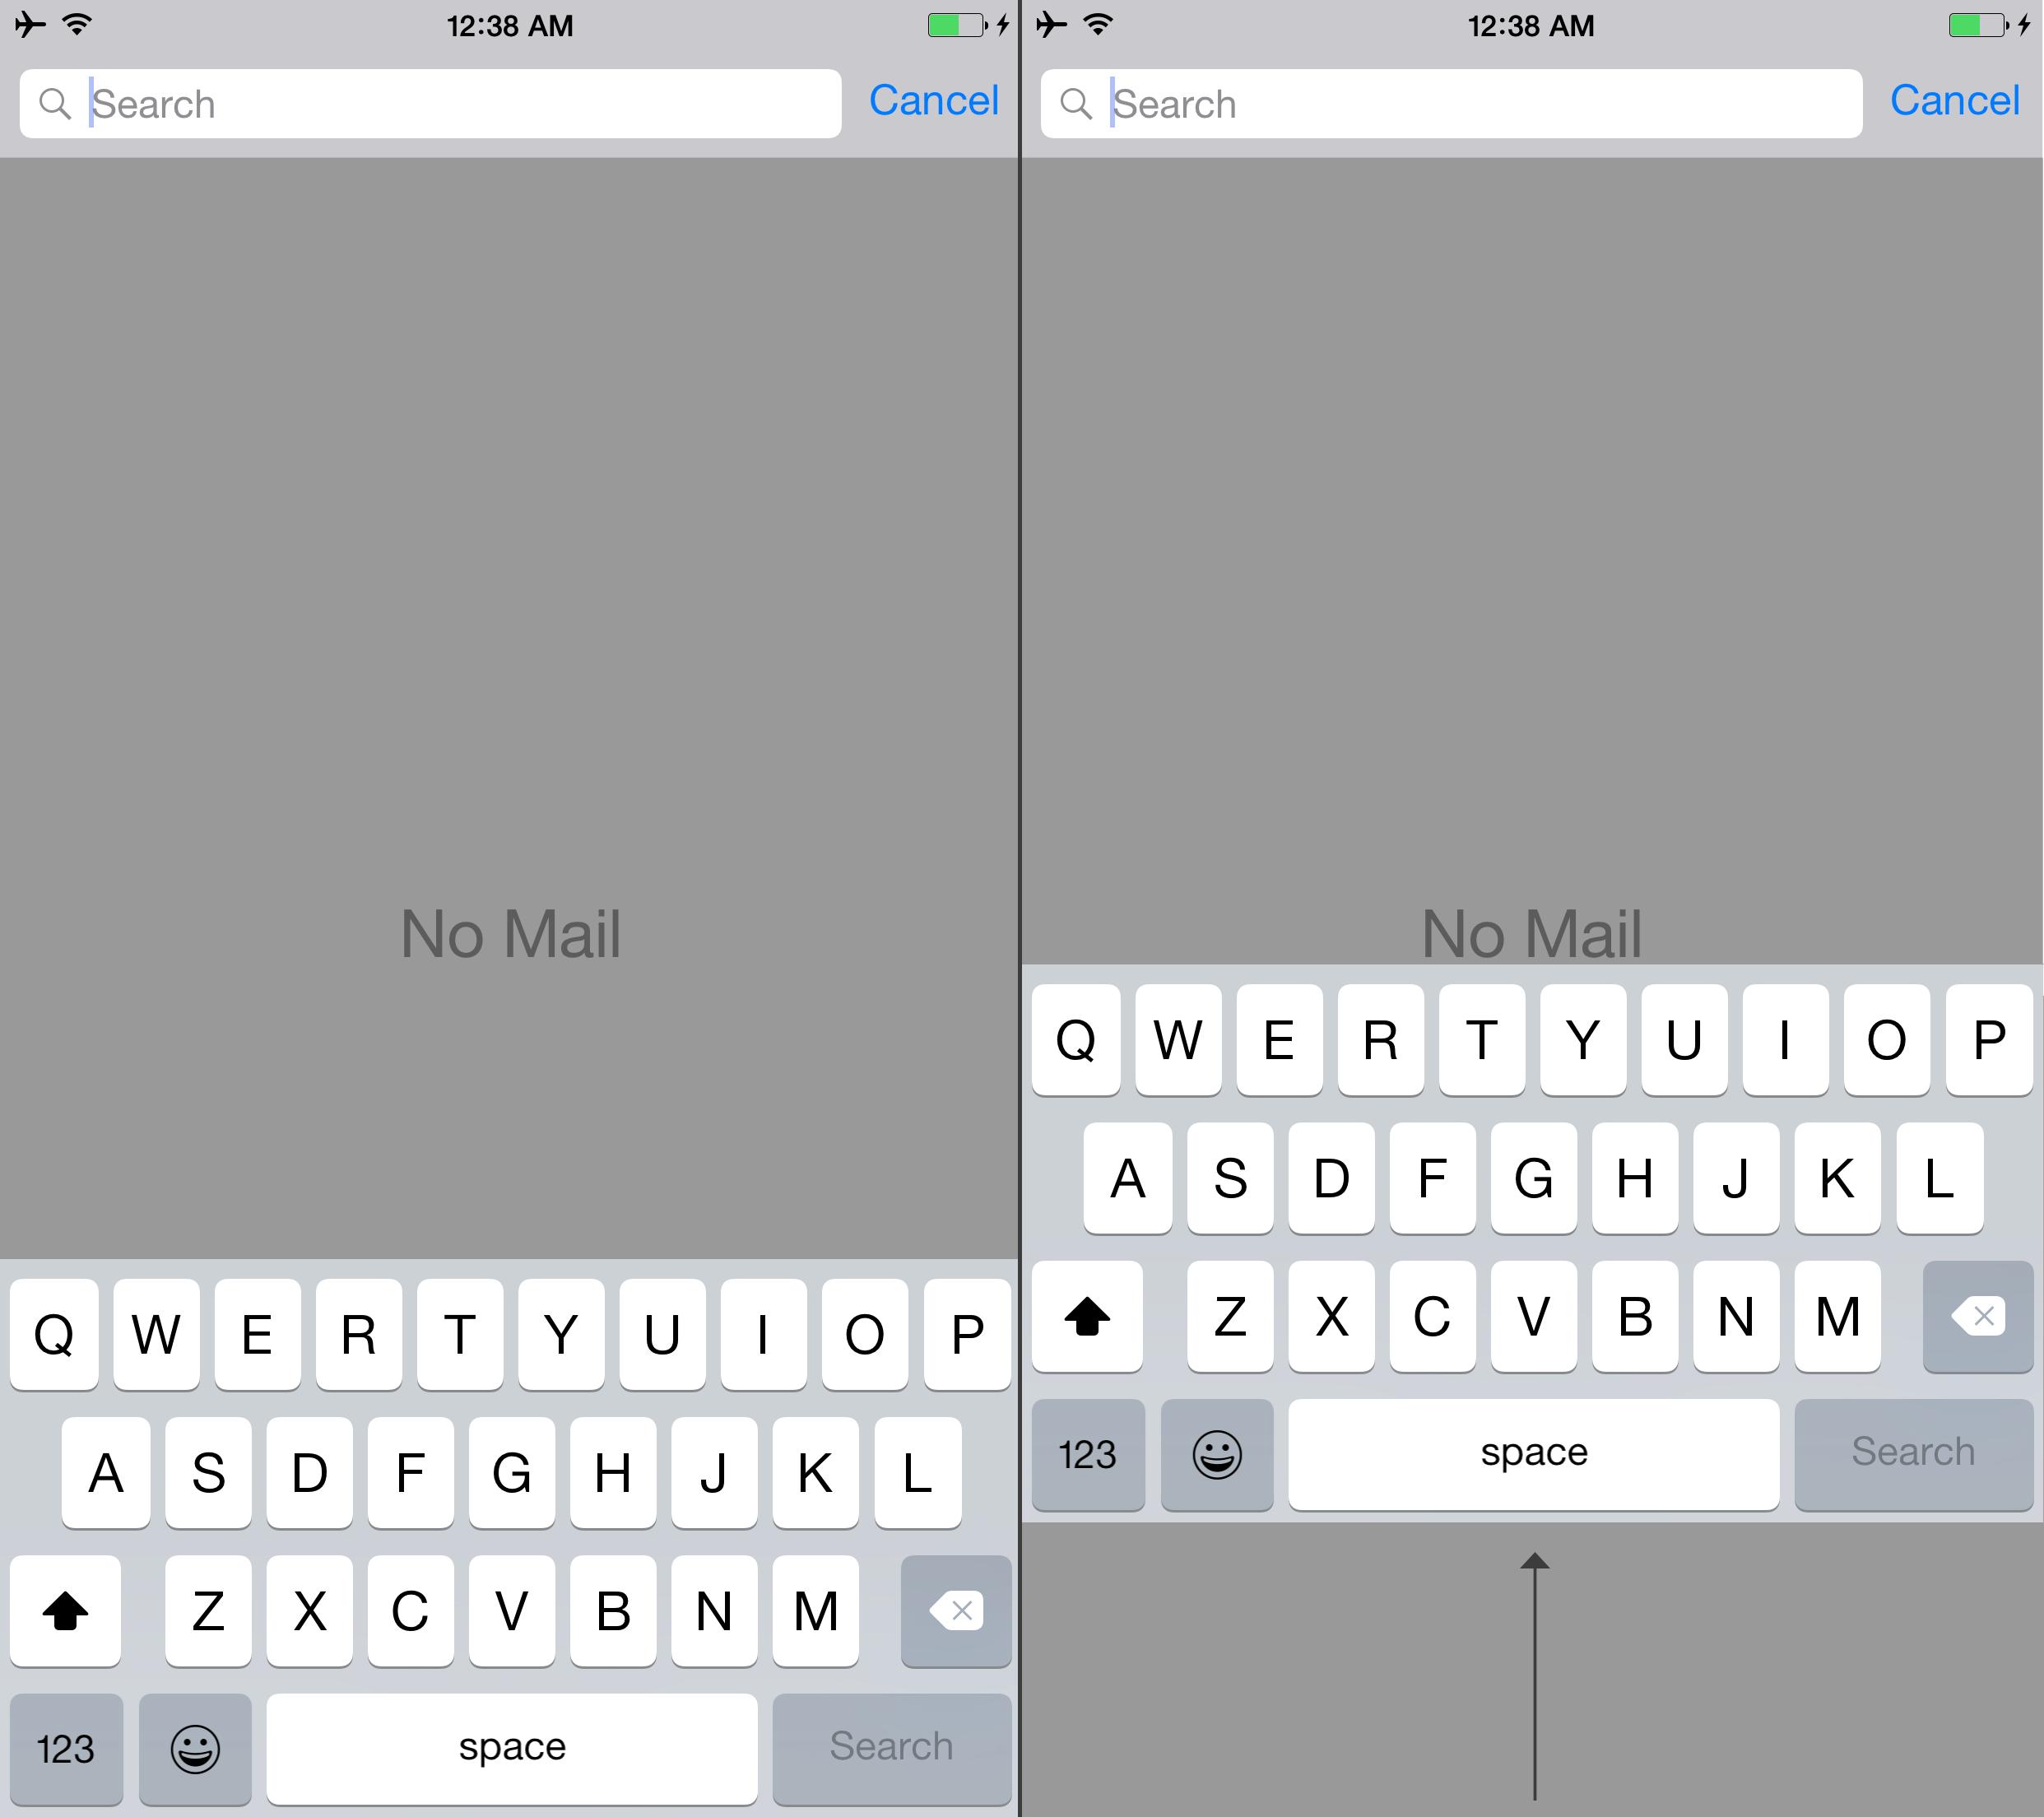 how to get a split screen on mac using keys